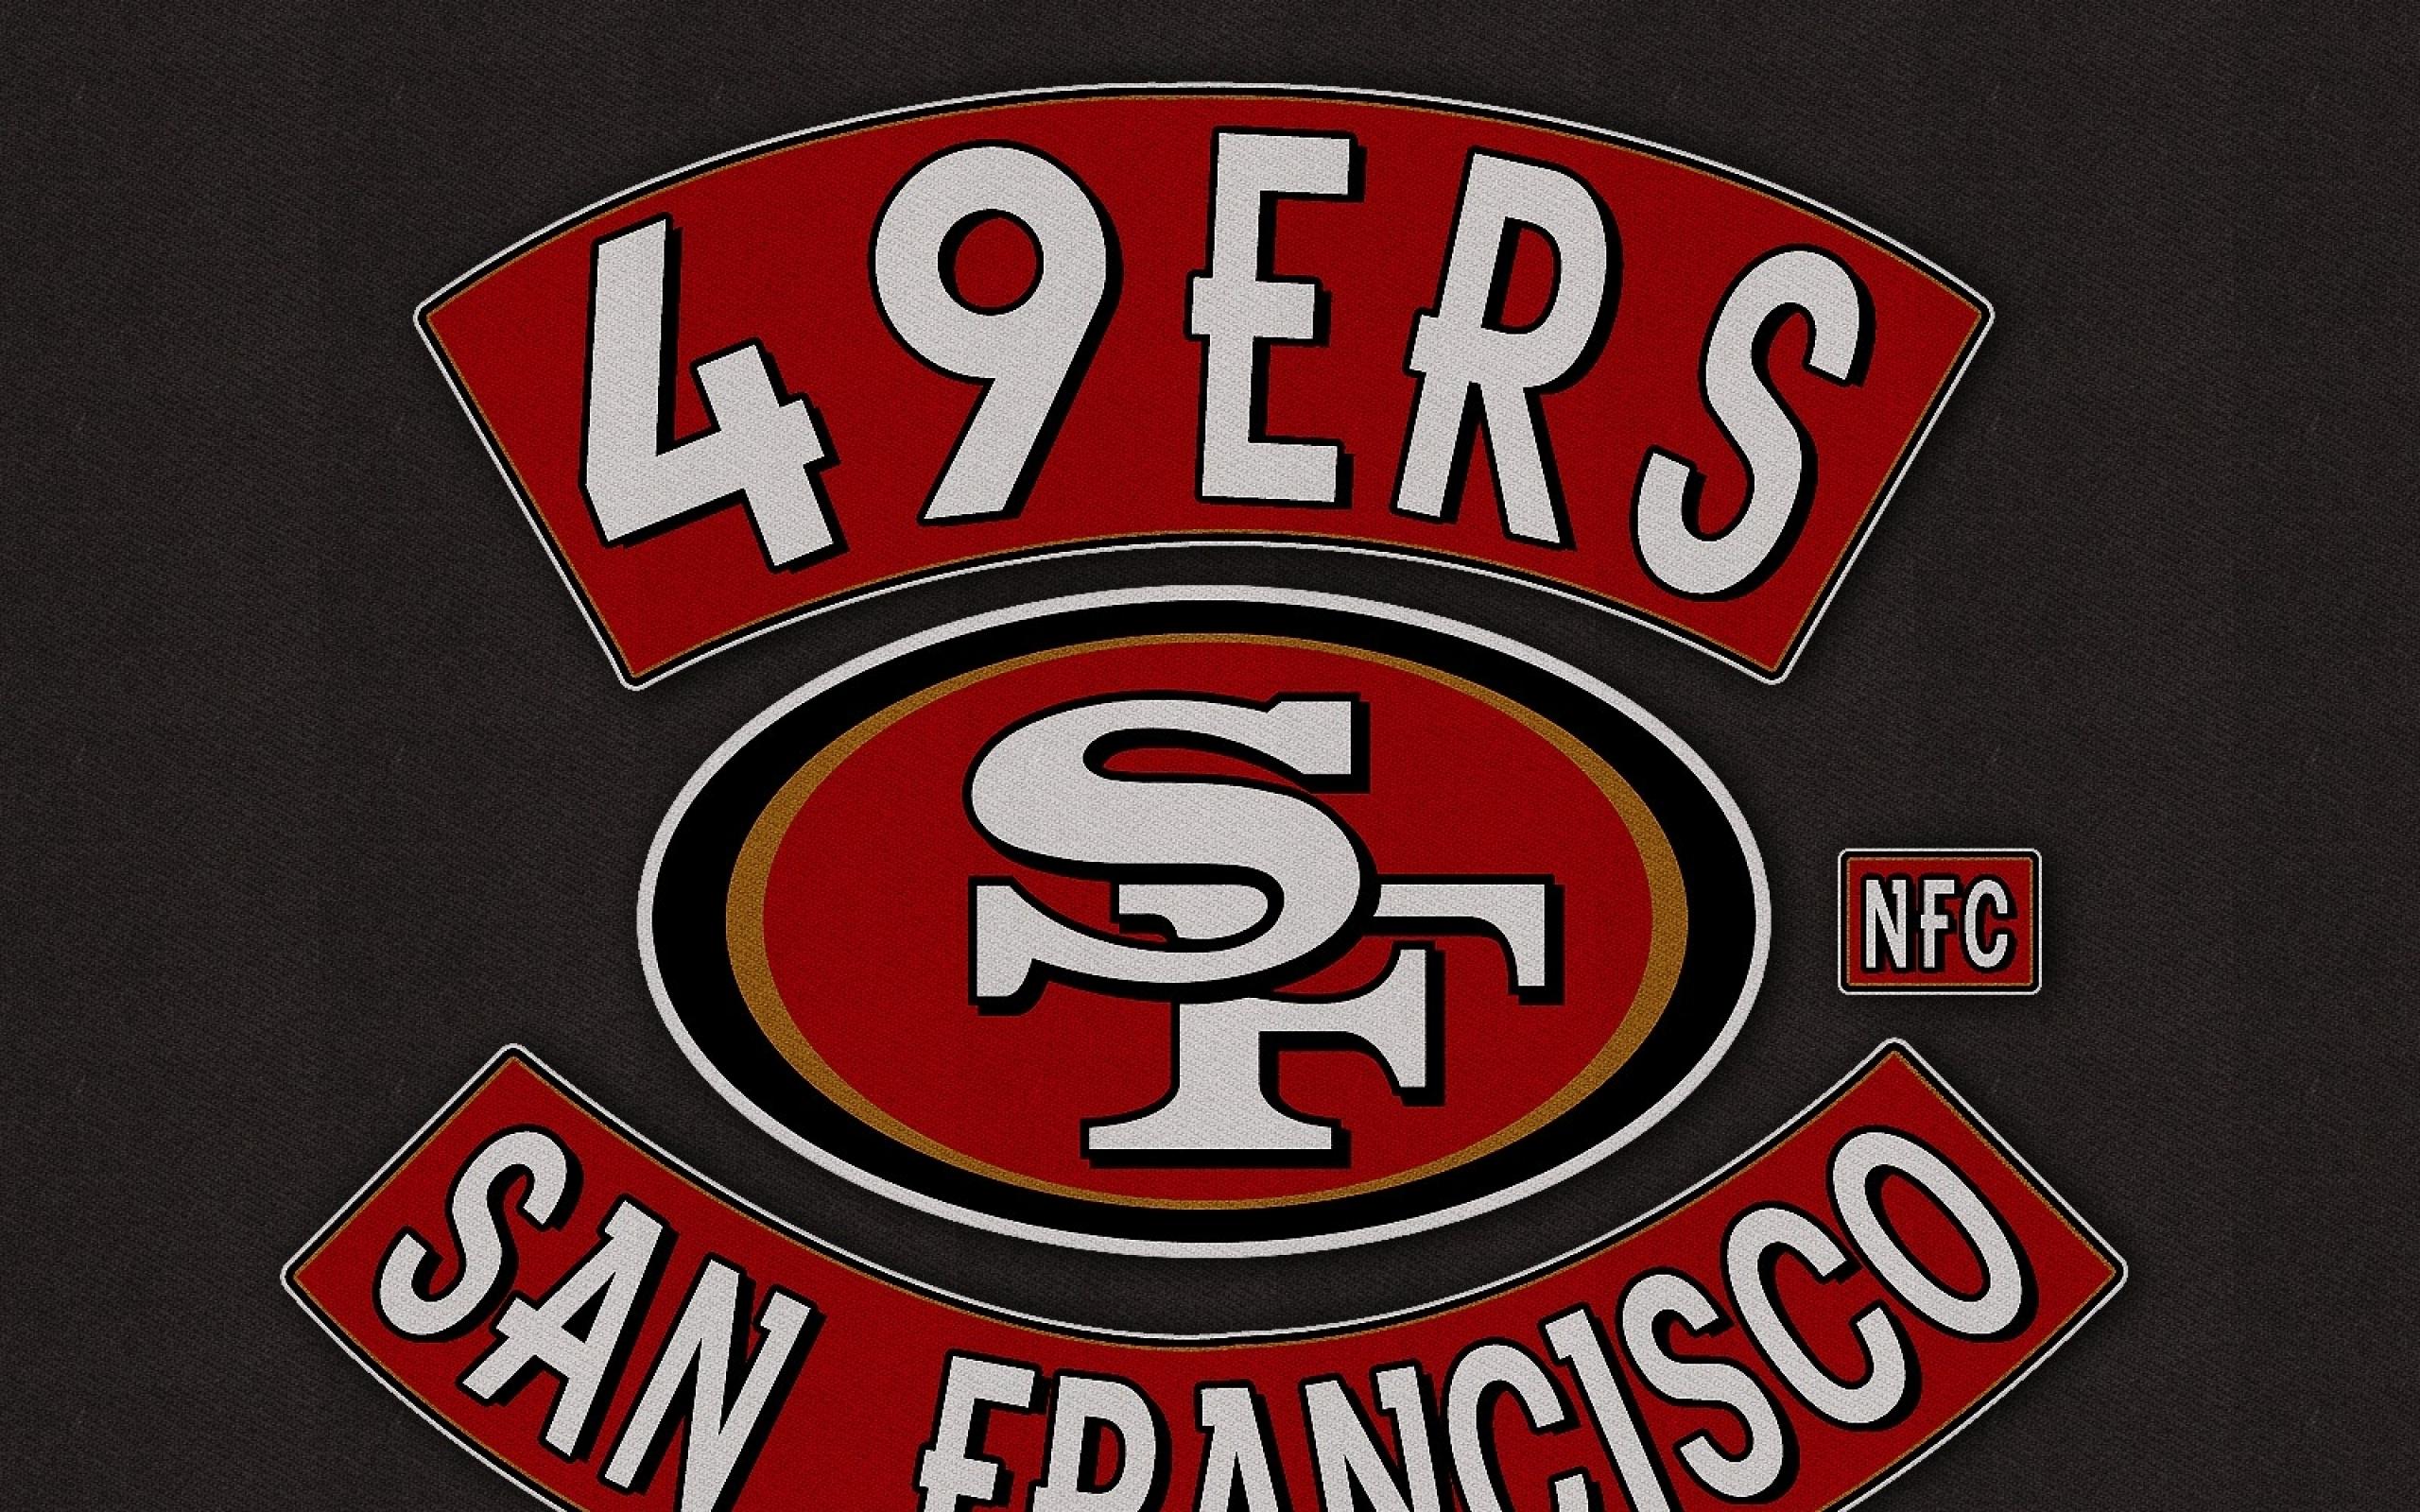 49ers Iphone Wallpaper Hd San Francisco 49ers Logo Hd Wallpapers Pixelstalk Net